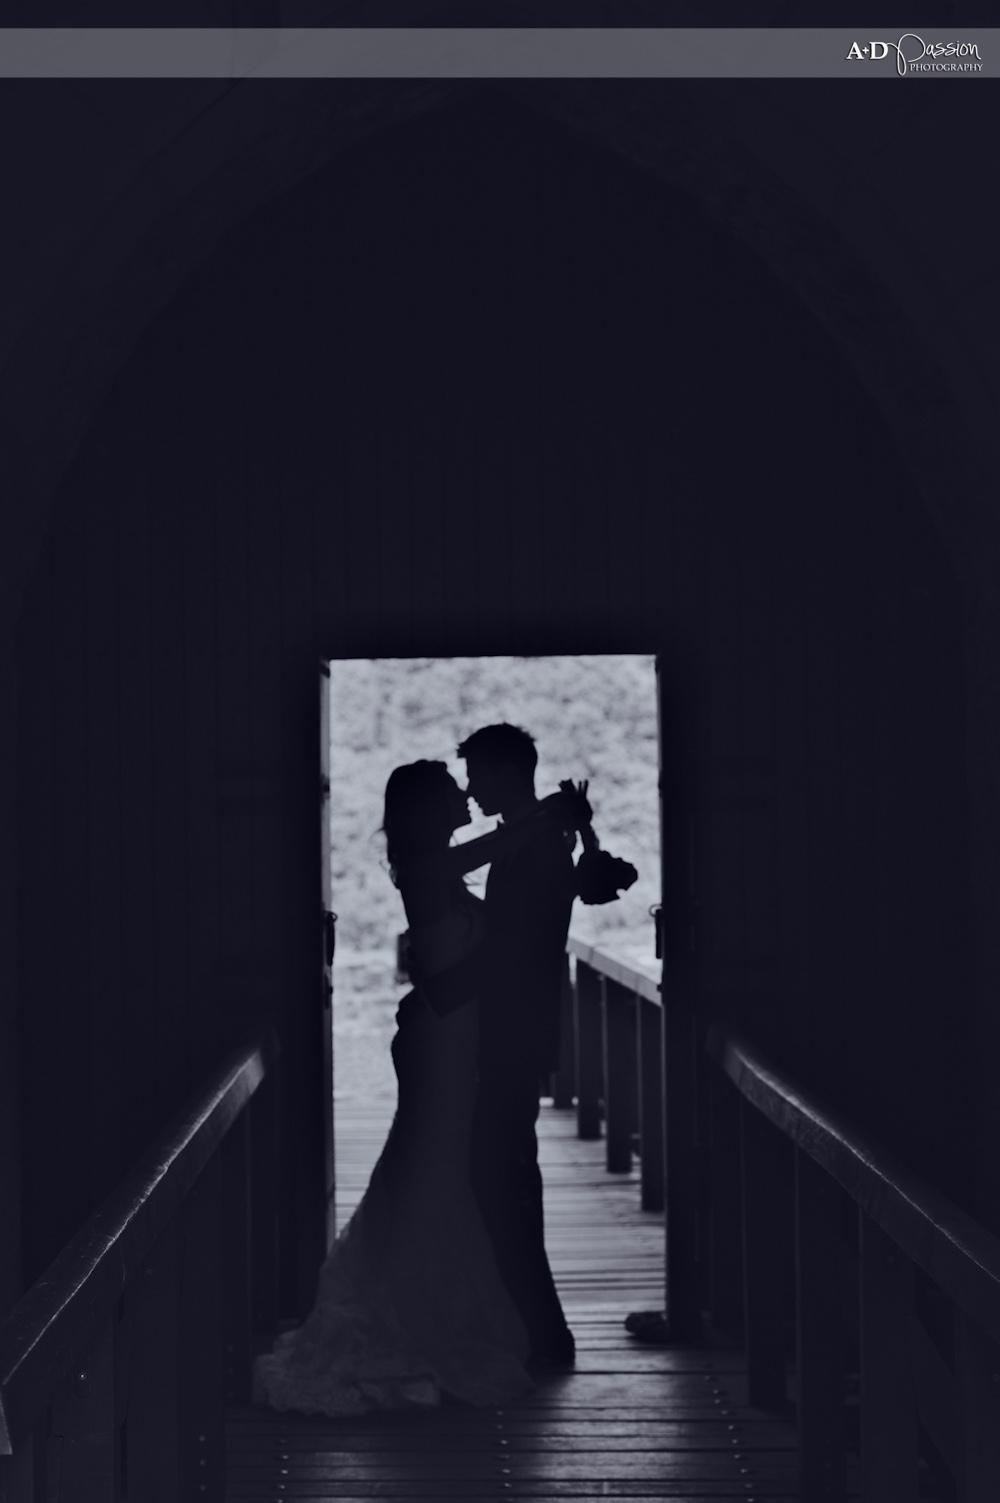 AD Passion Photography | fotograf-profesionist-nunta-piatra-neamt-lavinia-si-mihai_ttd_0044 | Adelin, Dida, fotograf profesionist, fotograf de nunta, fotografie de nunta, fotograf Timisoara, fotograf Craiova, fotograf Bucuresti, fotograf Arad, nunta Timisoara, nunta Arad, nunta Bucuresti, nunta Craiova